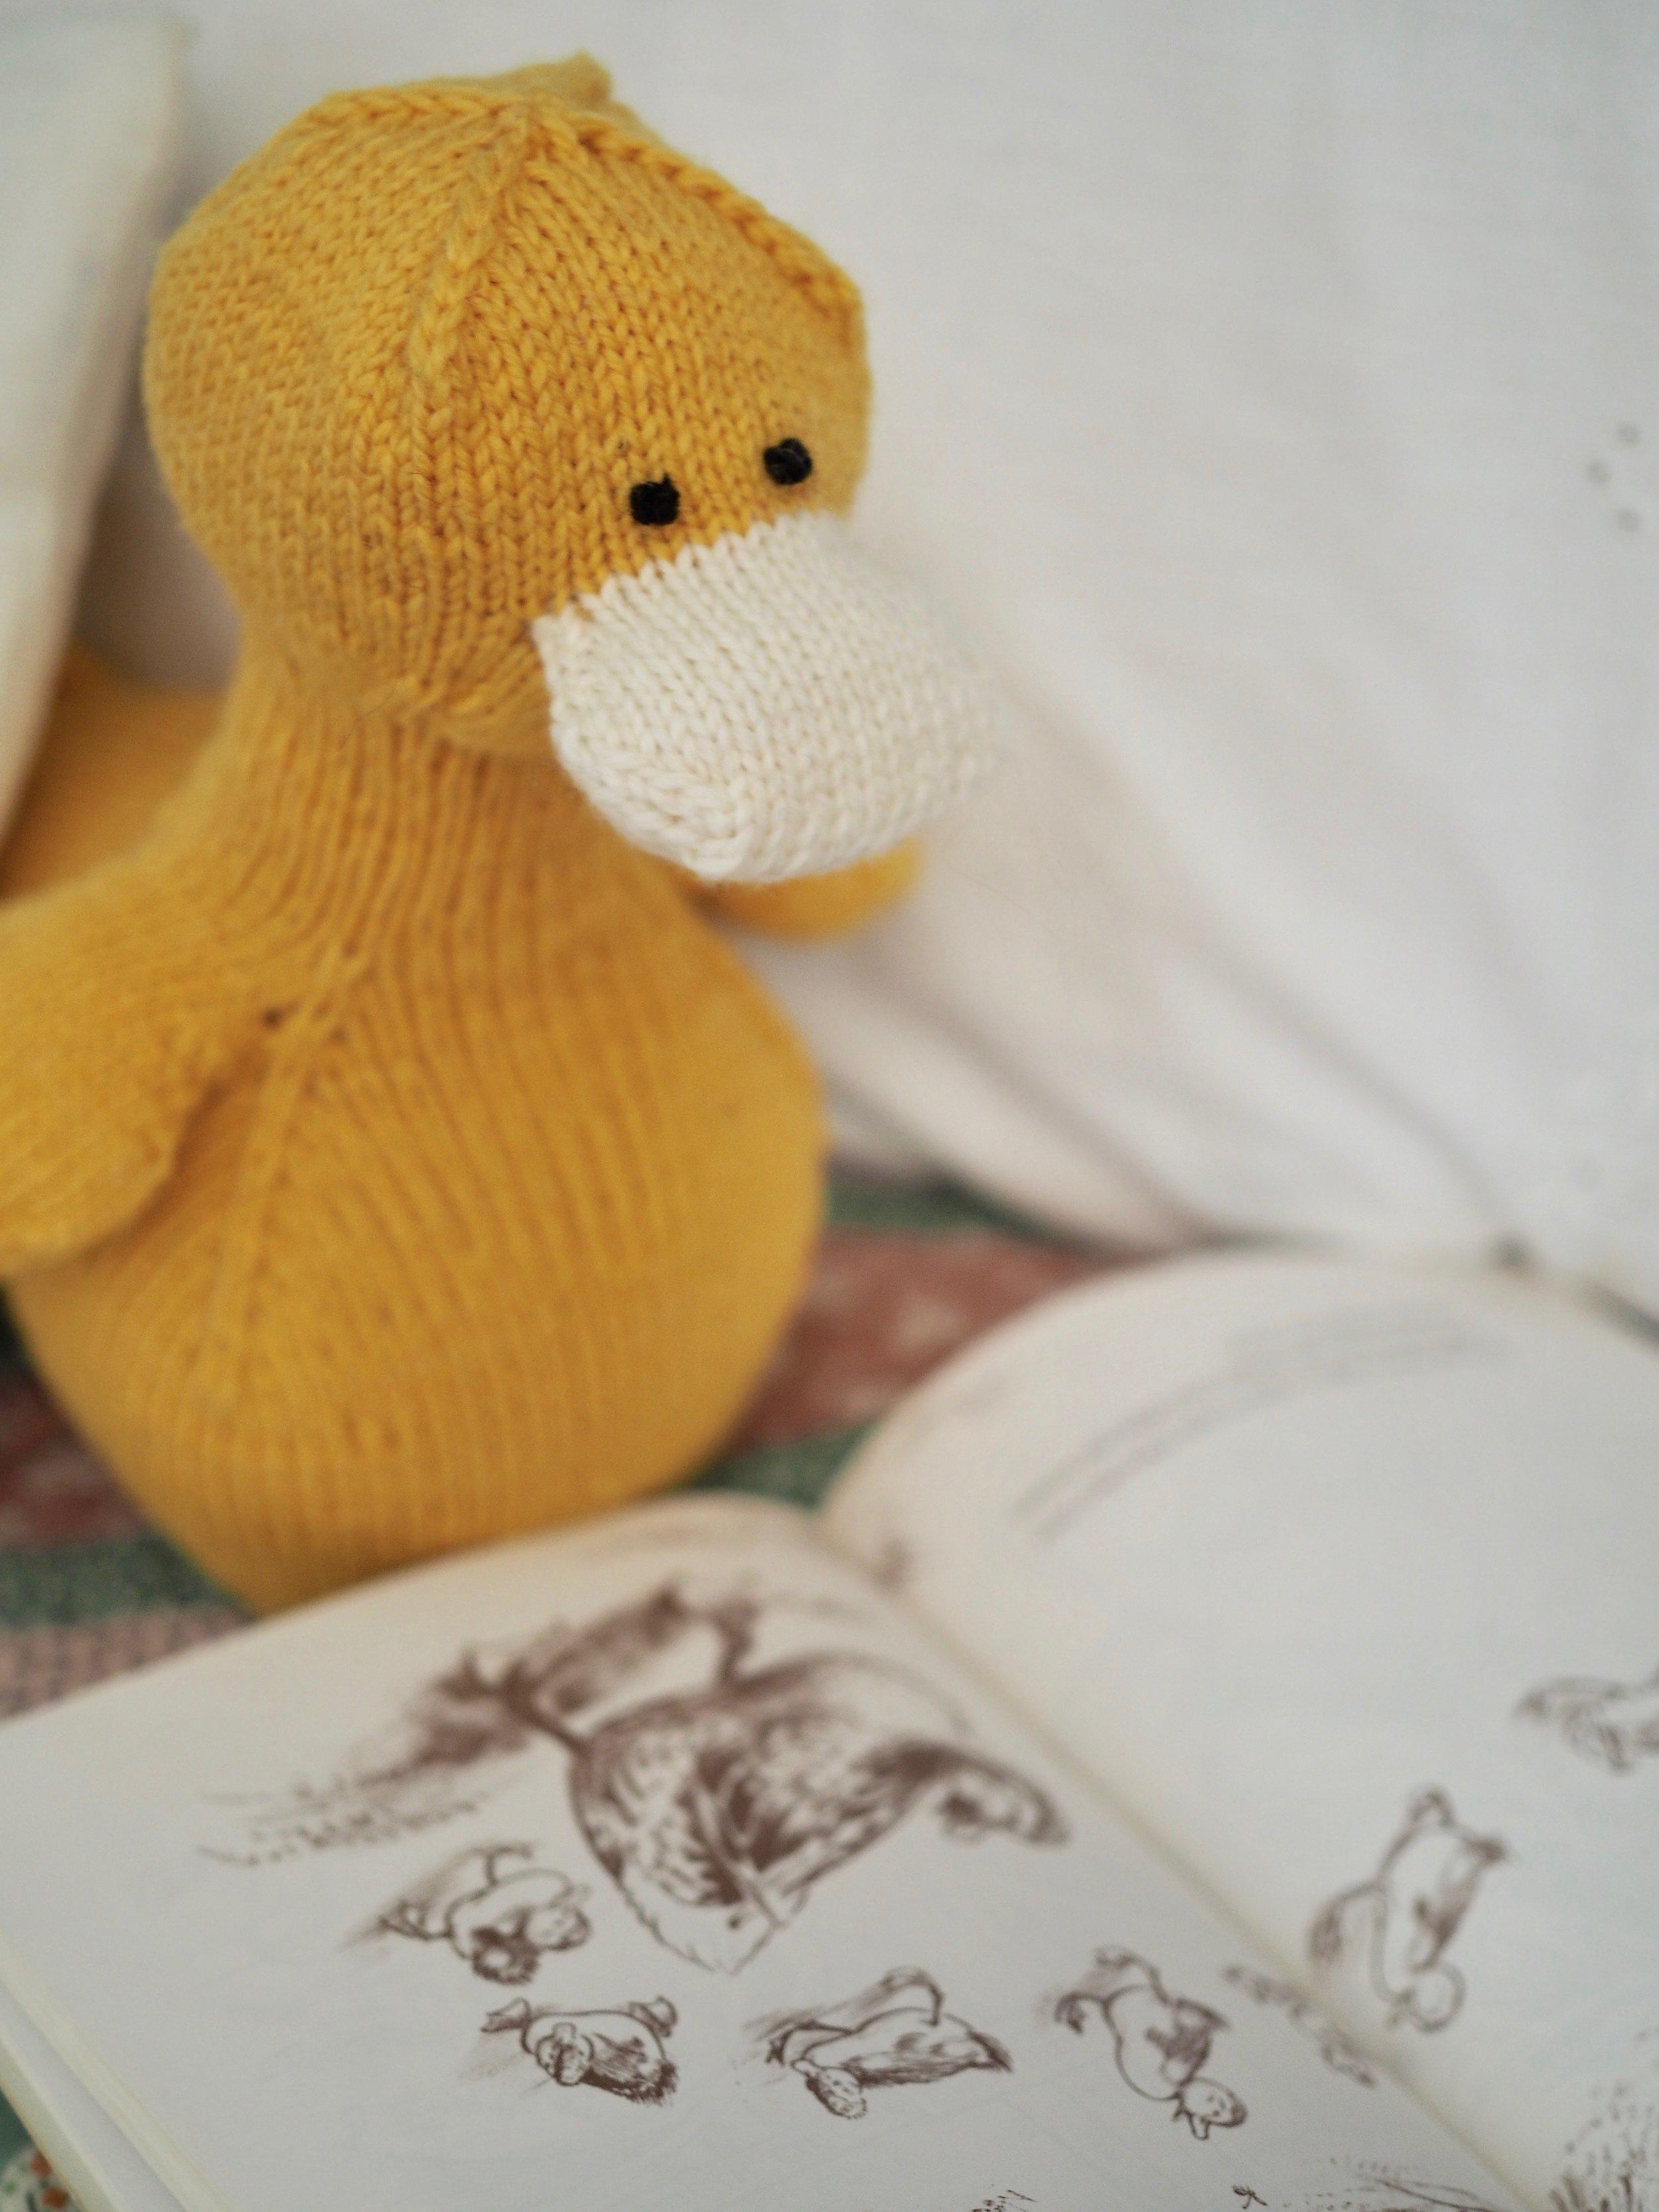 Domenic Duck by Leah B. Thibault